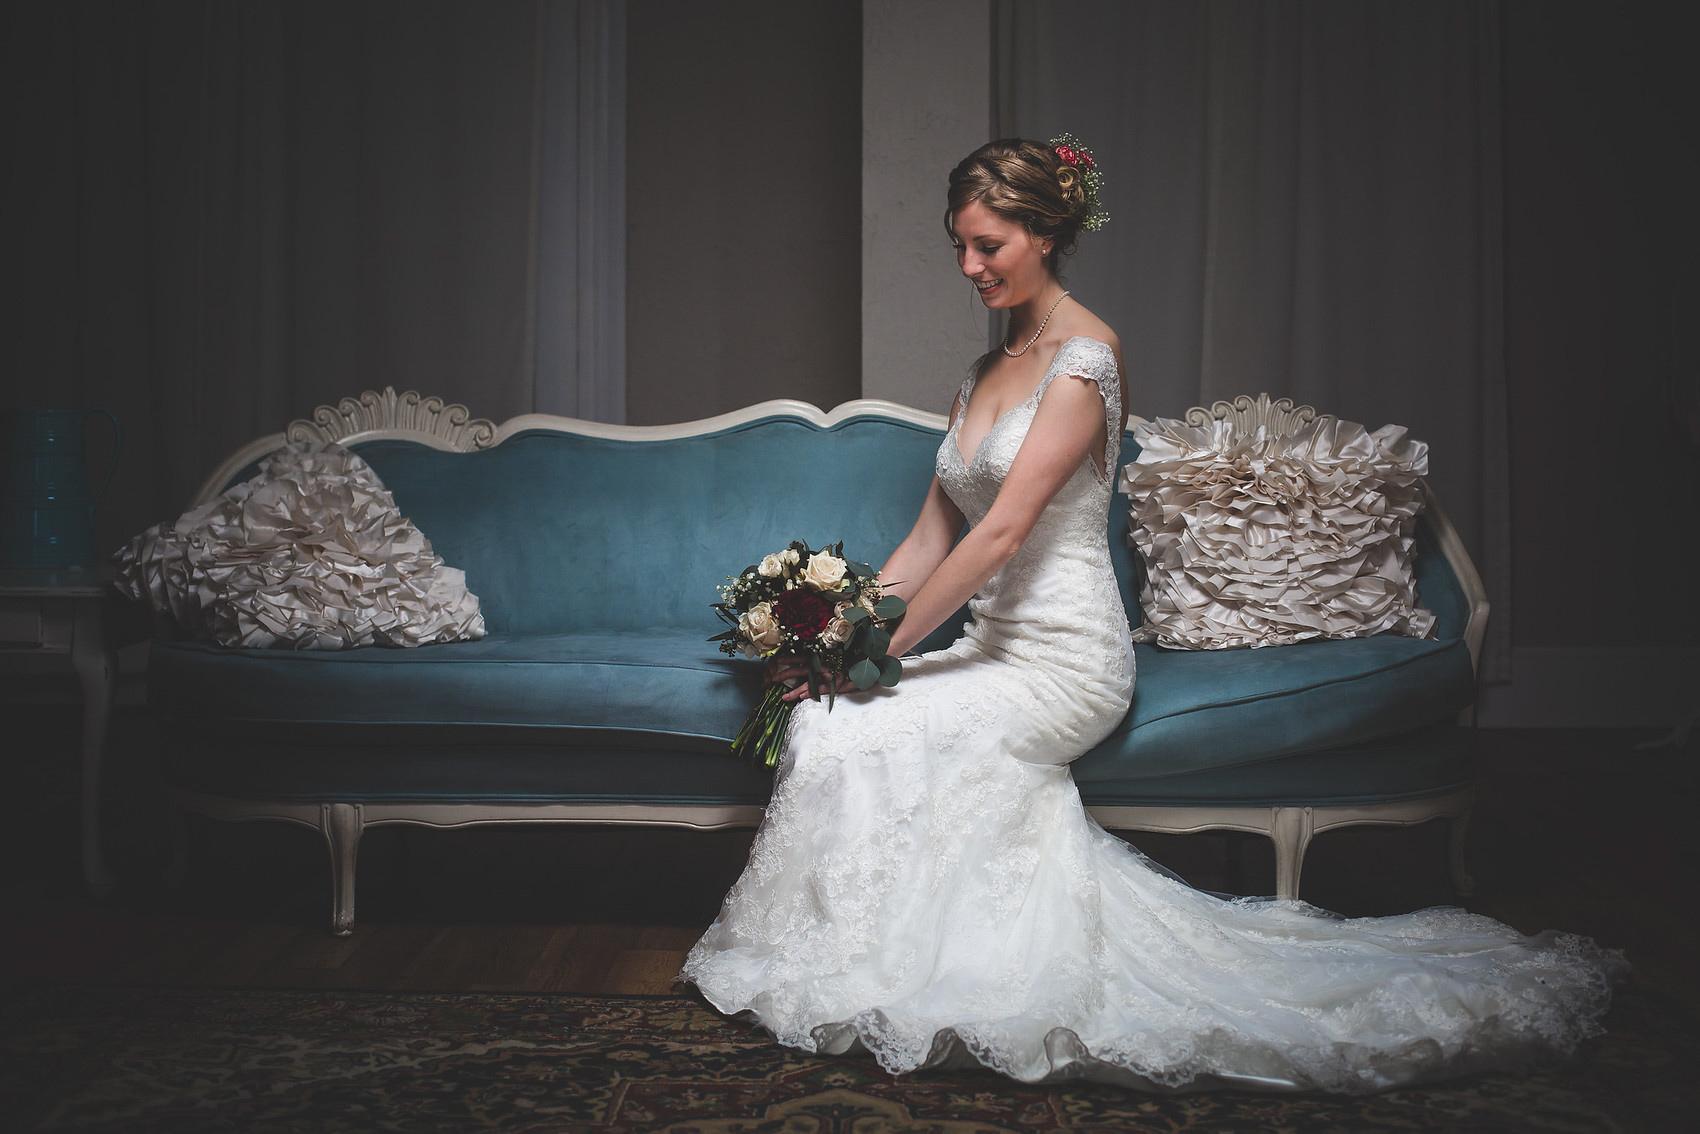 Adam-Szrmack-Bowing-the-white-room-st-augustine-wedding-photographer-29.jpg